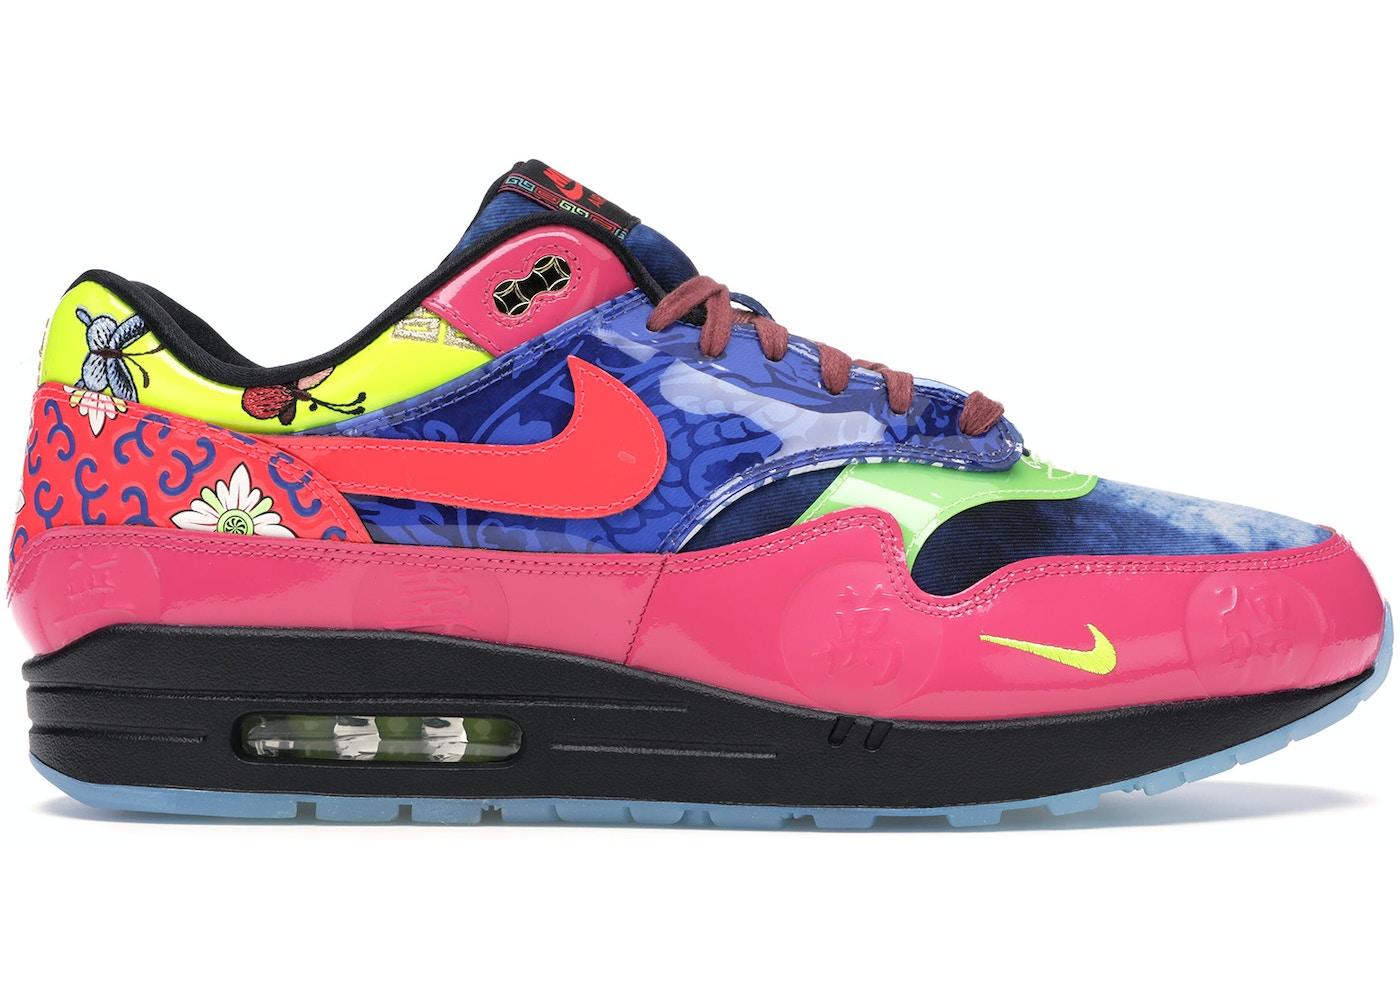 motivo Horror En marcha  Nike Air Max 1 Chinese New Year Longevity (2020) - CU8861-460